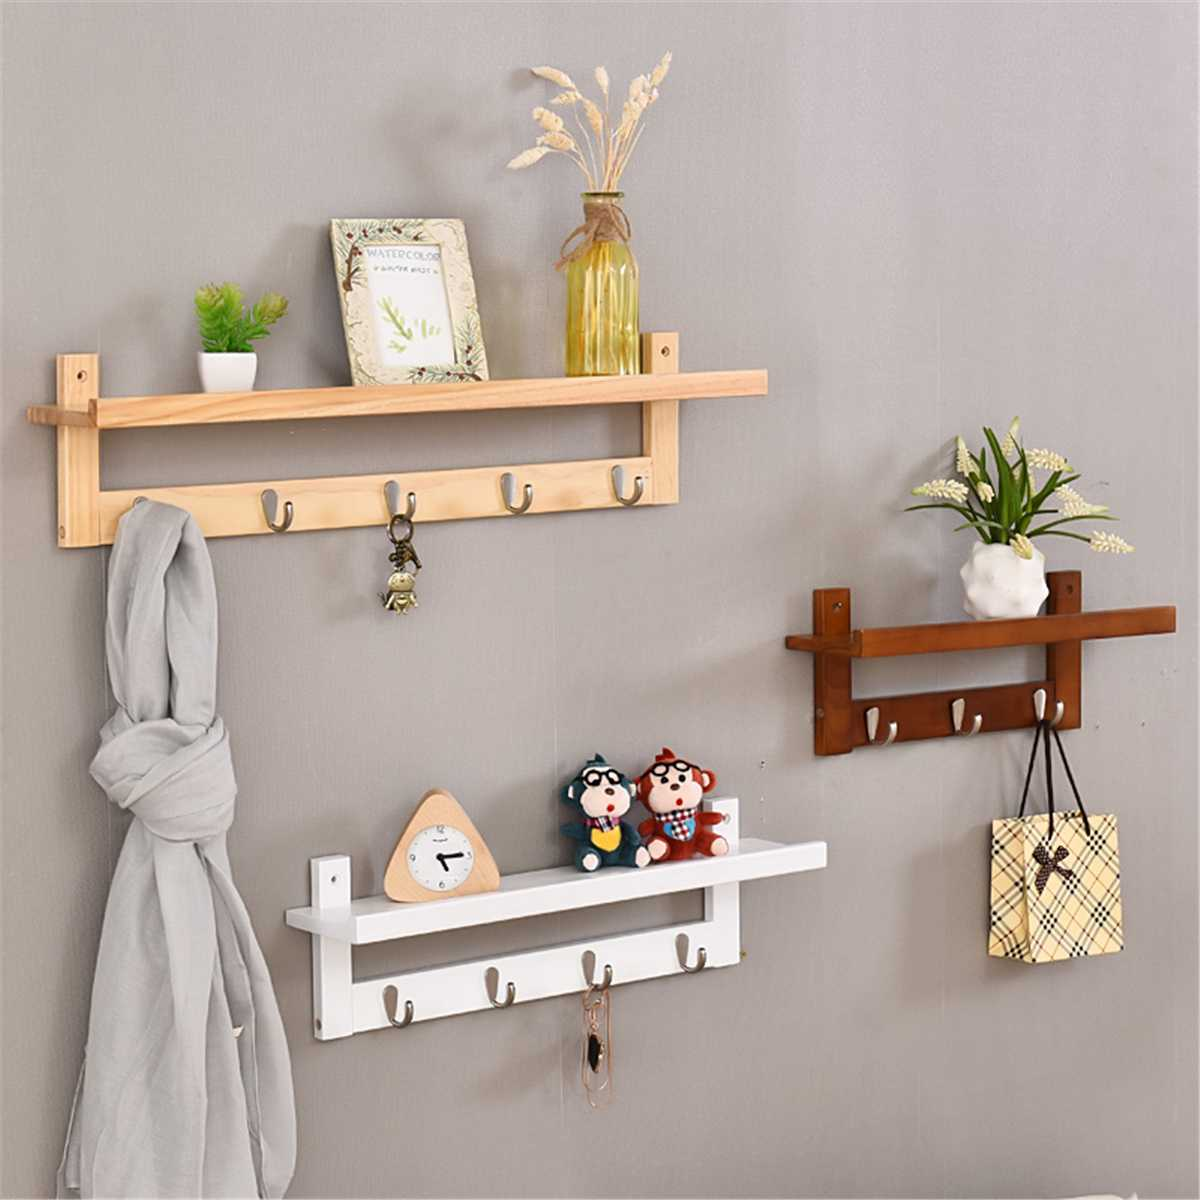 5 Hook Wall Mounted Rail Coat Hat Hanger Shelf Display Rack Storage Shelves Organizer Home Rack Hanging Hooks Home Decor